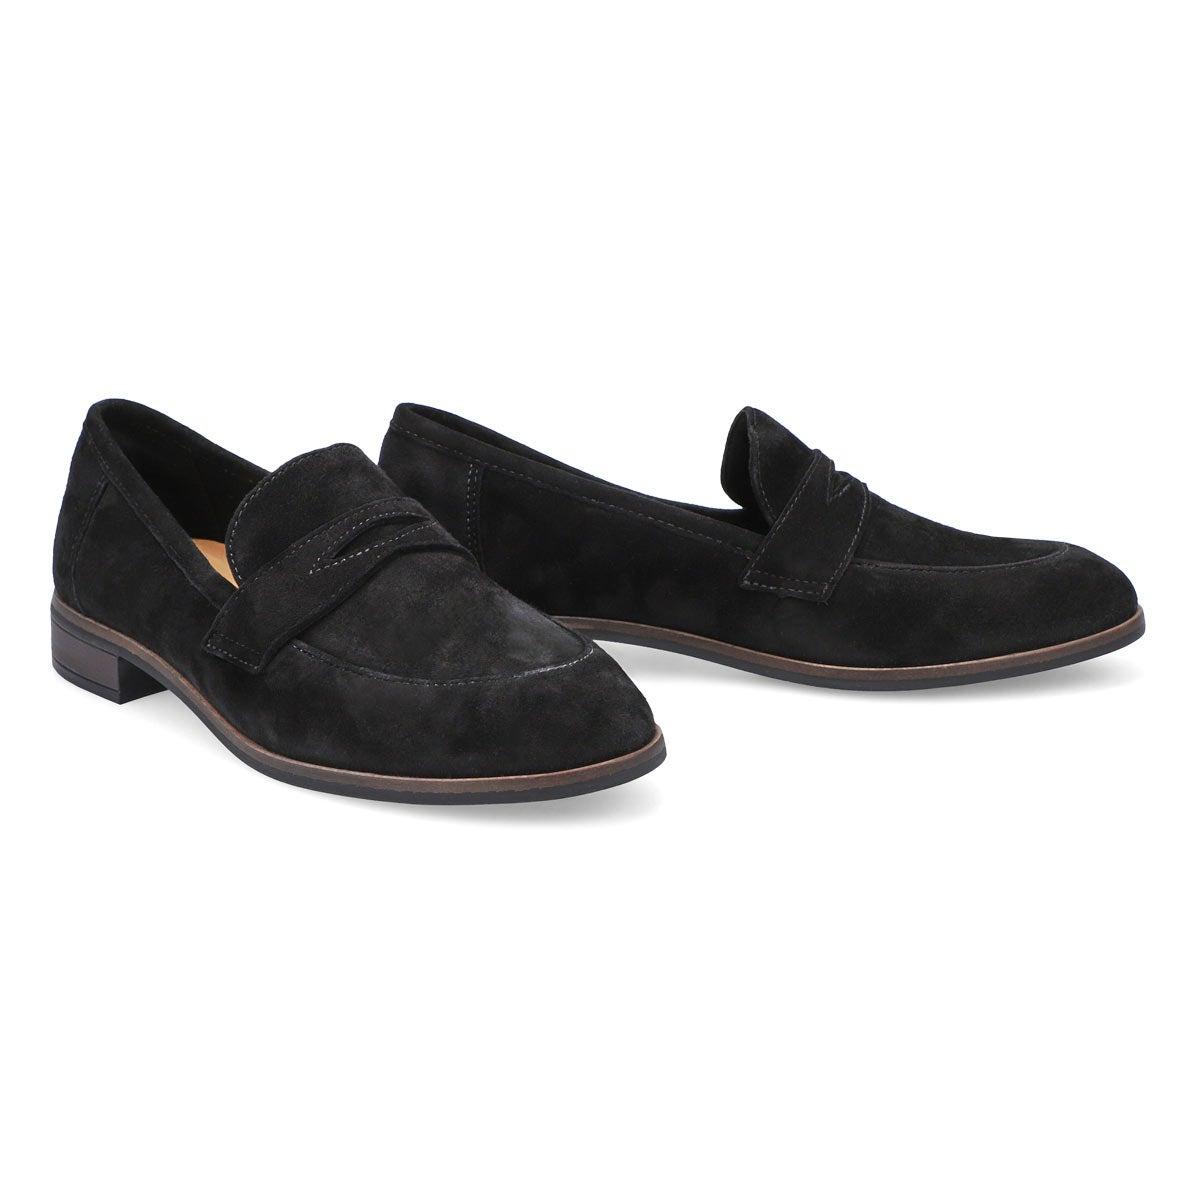 Women's Trish Rose Casual Loafer - Black